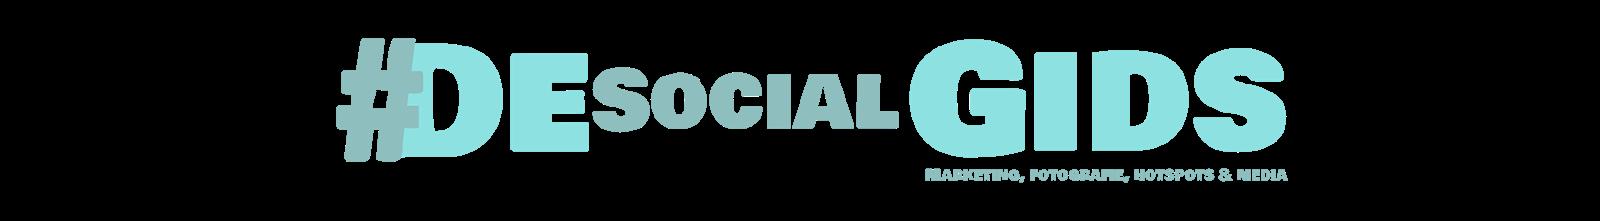 De Social Gids